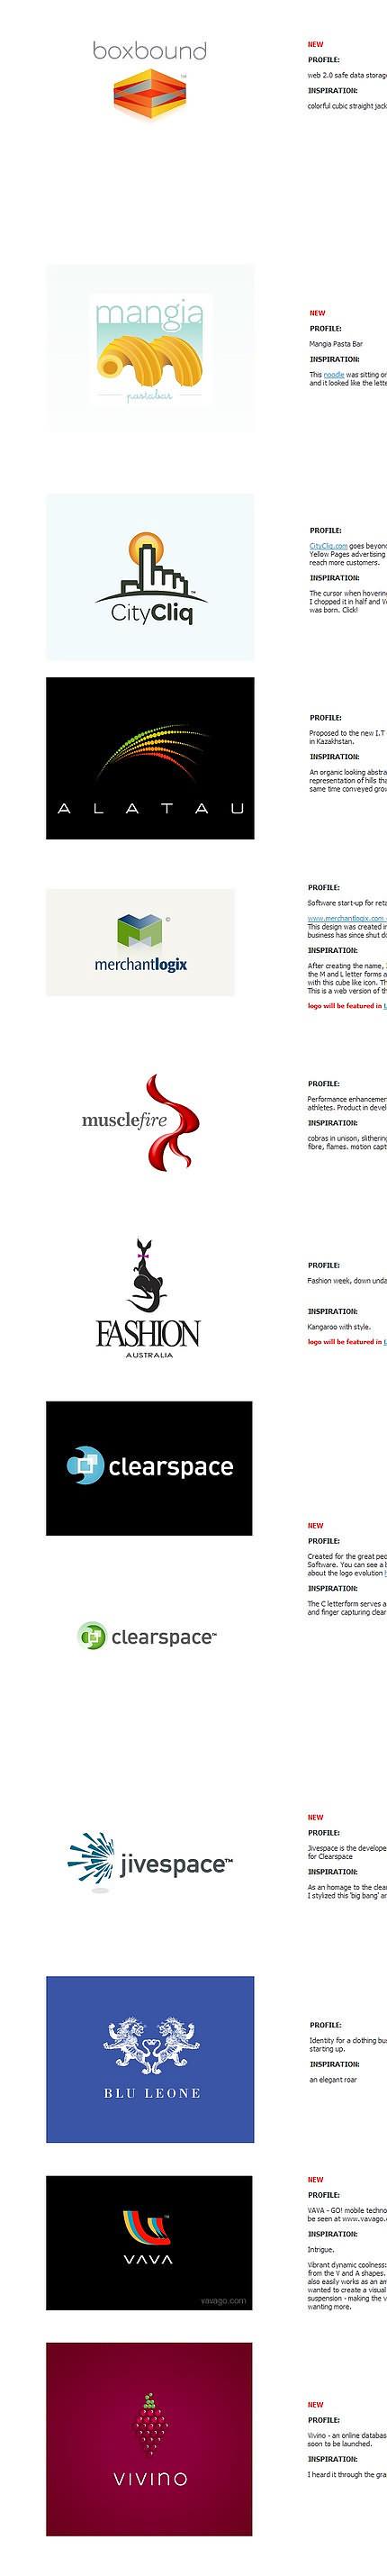 Raja Sandhu - portfolio de logo-uri frumoase